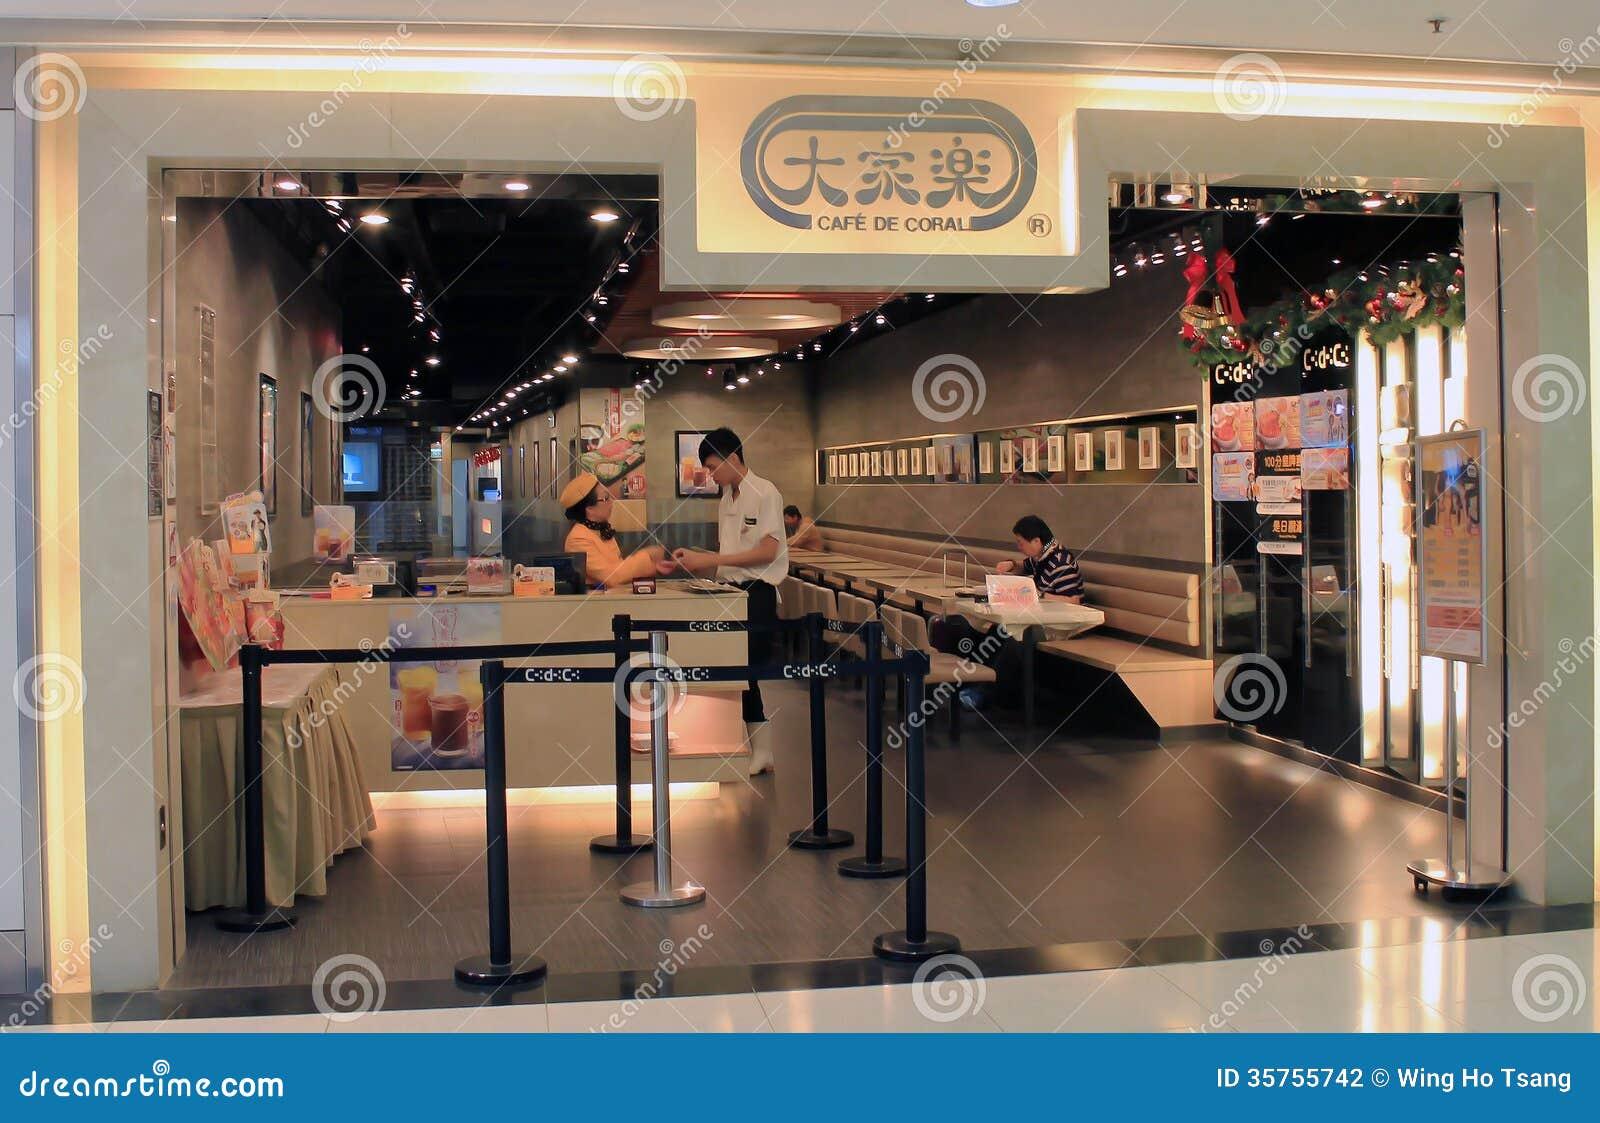 Cafe De Coral Fast Food